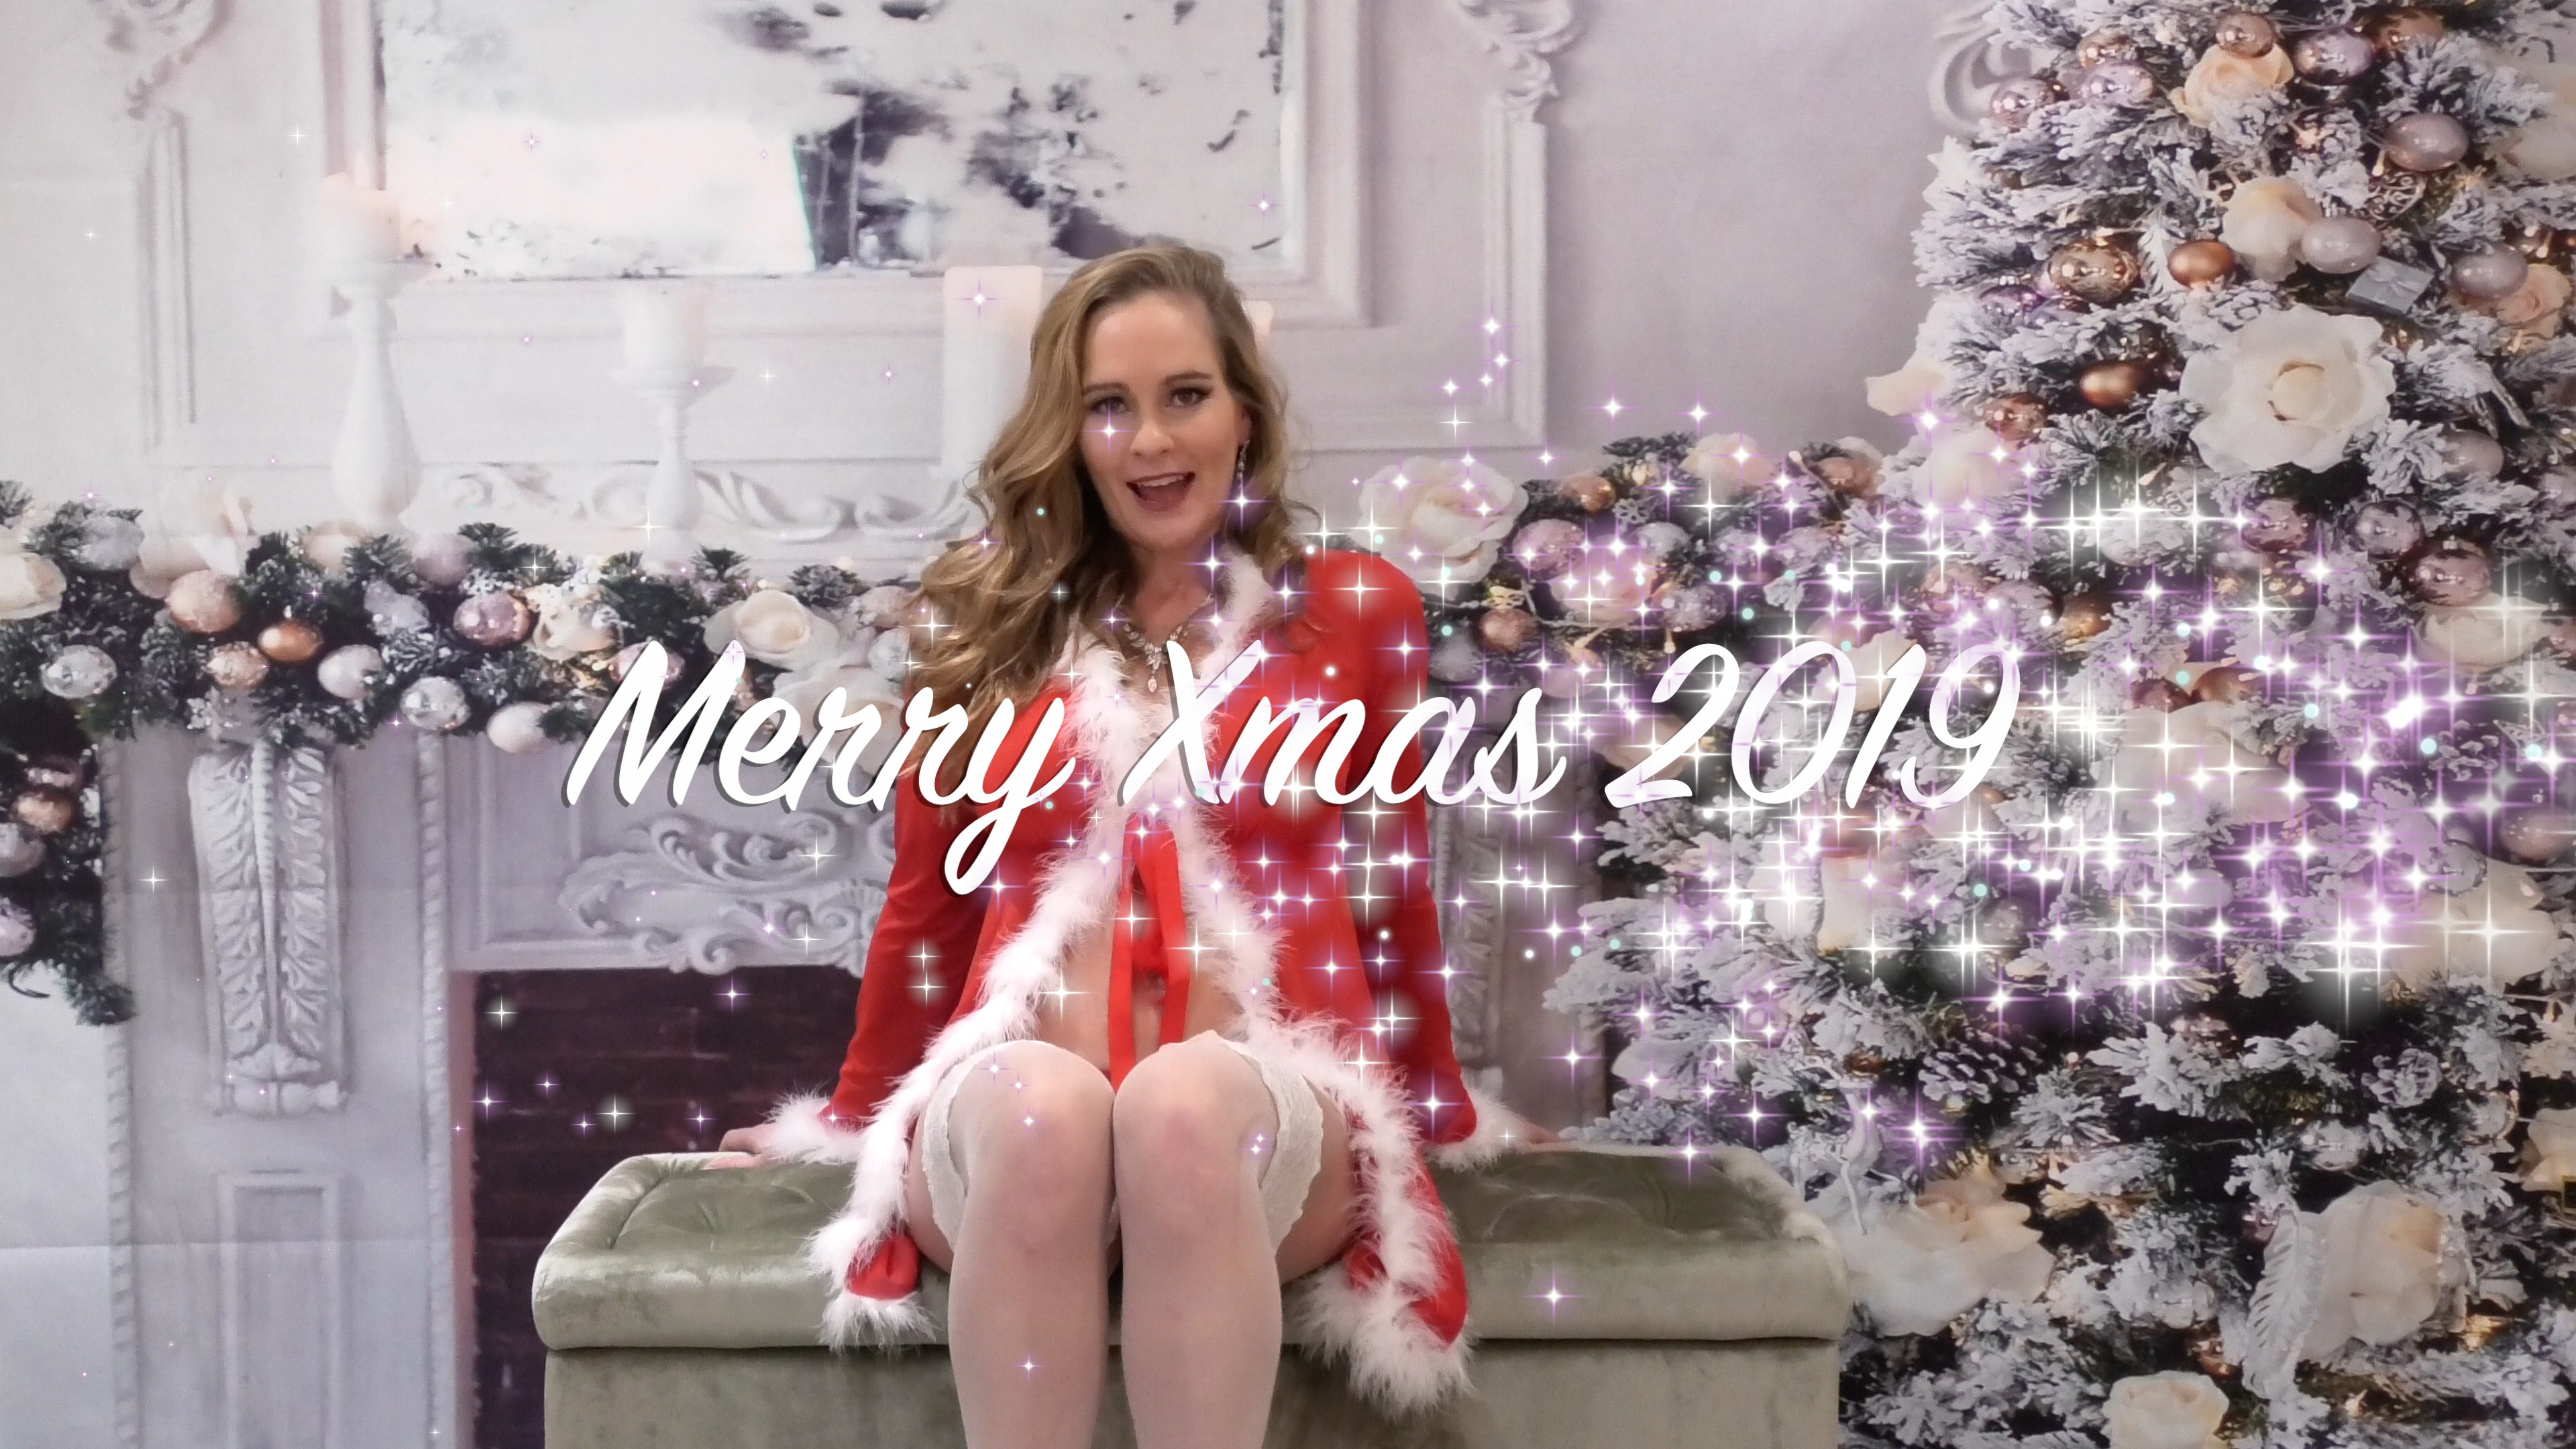 Merry Xmas 2019 1